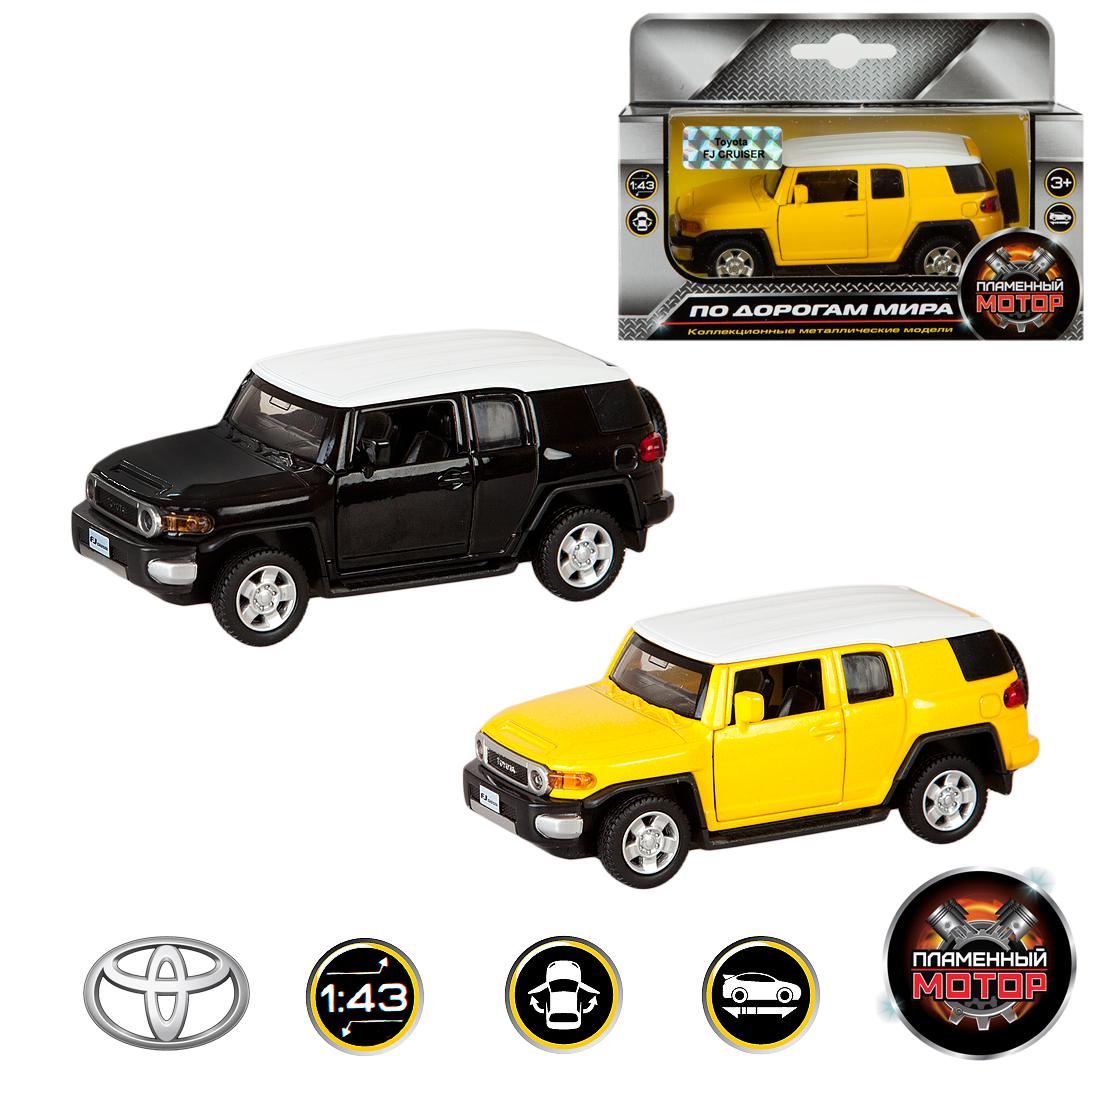 Игрушечные машинки и техника Наша игрушка Toyota FJ Cruiser (870130) 1:43 игрушечные машинки и техника наша игрушка acura nsx